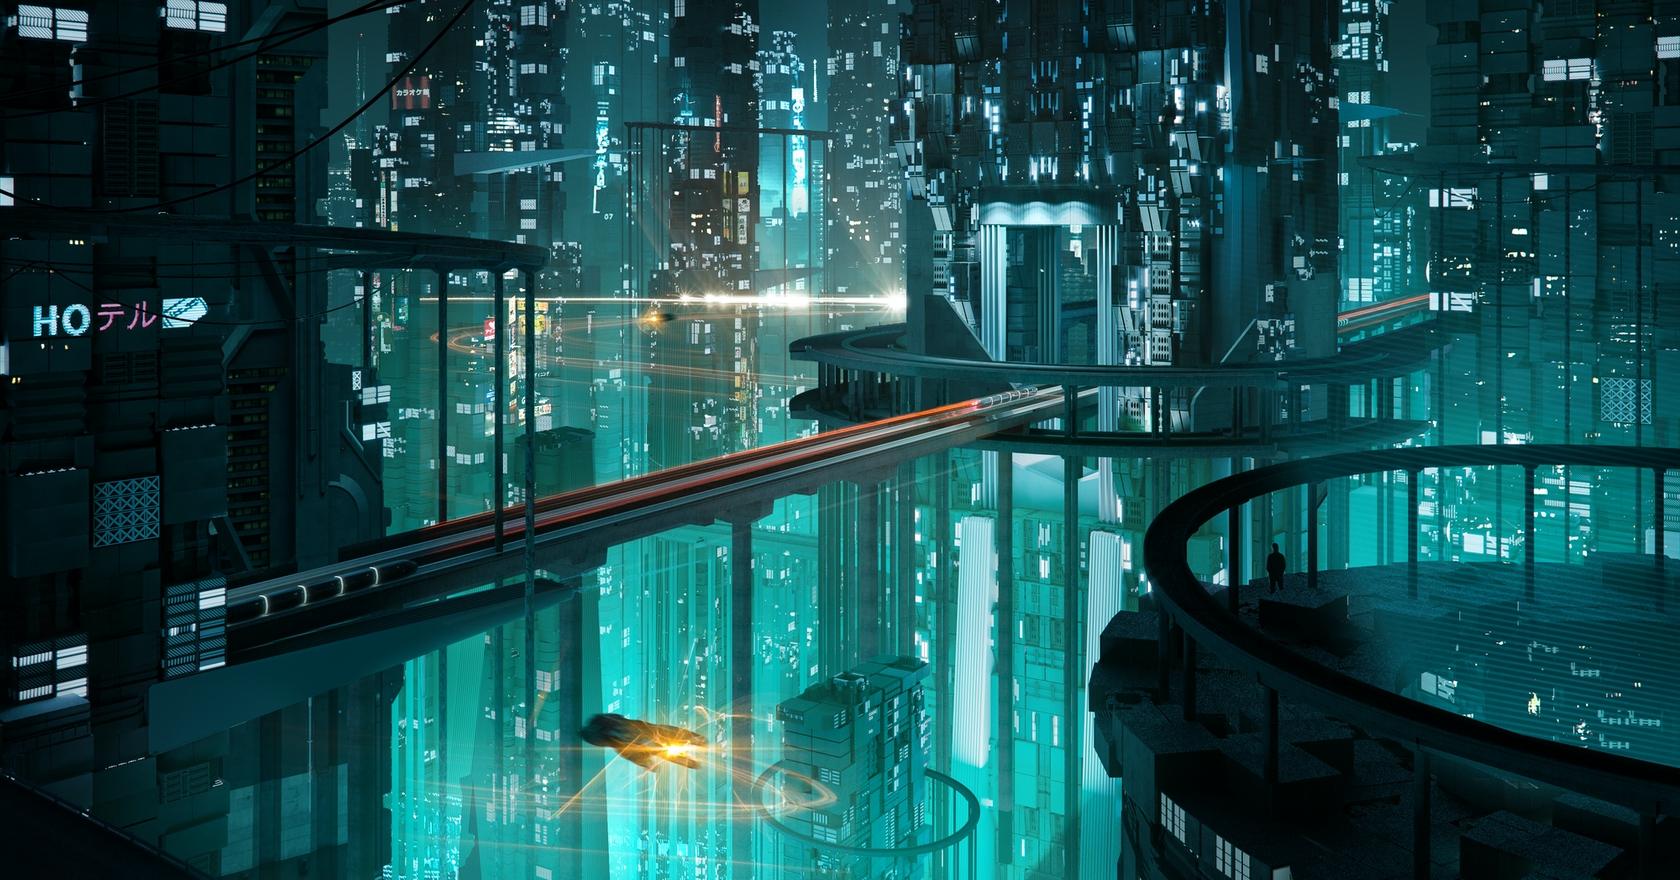 Futuristic city NFT